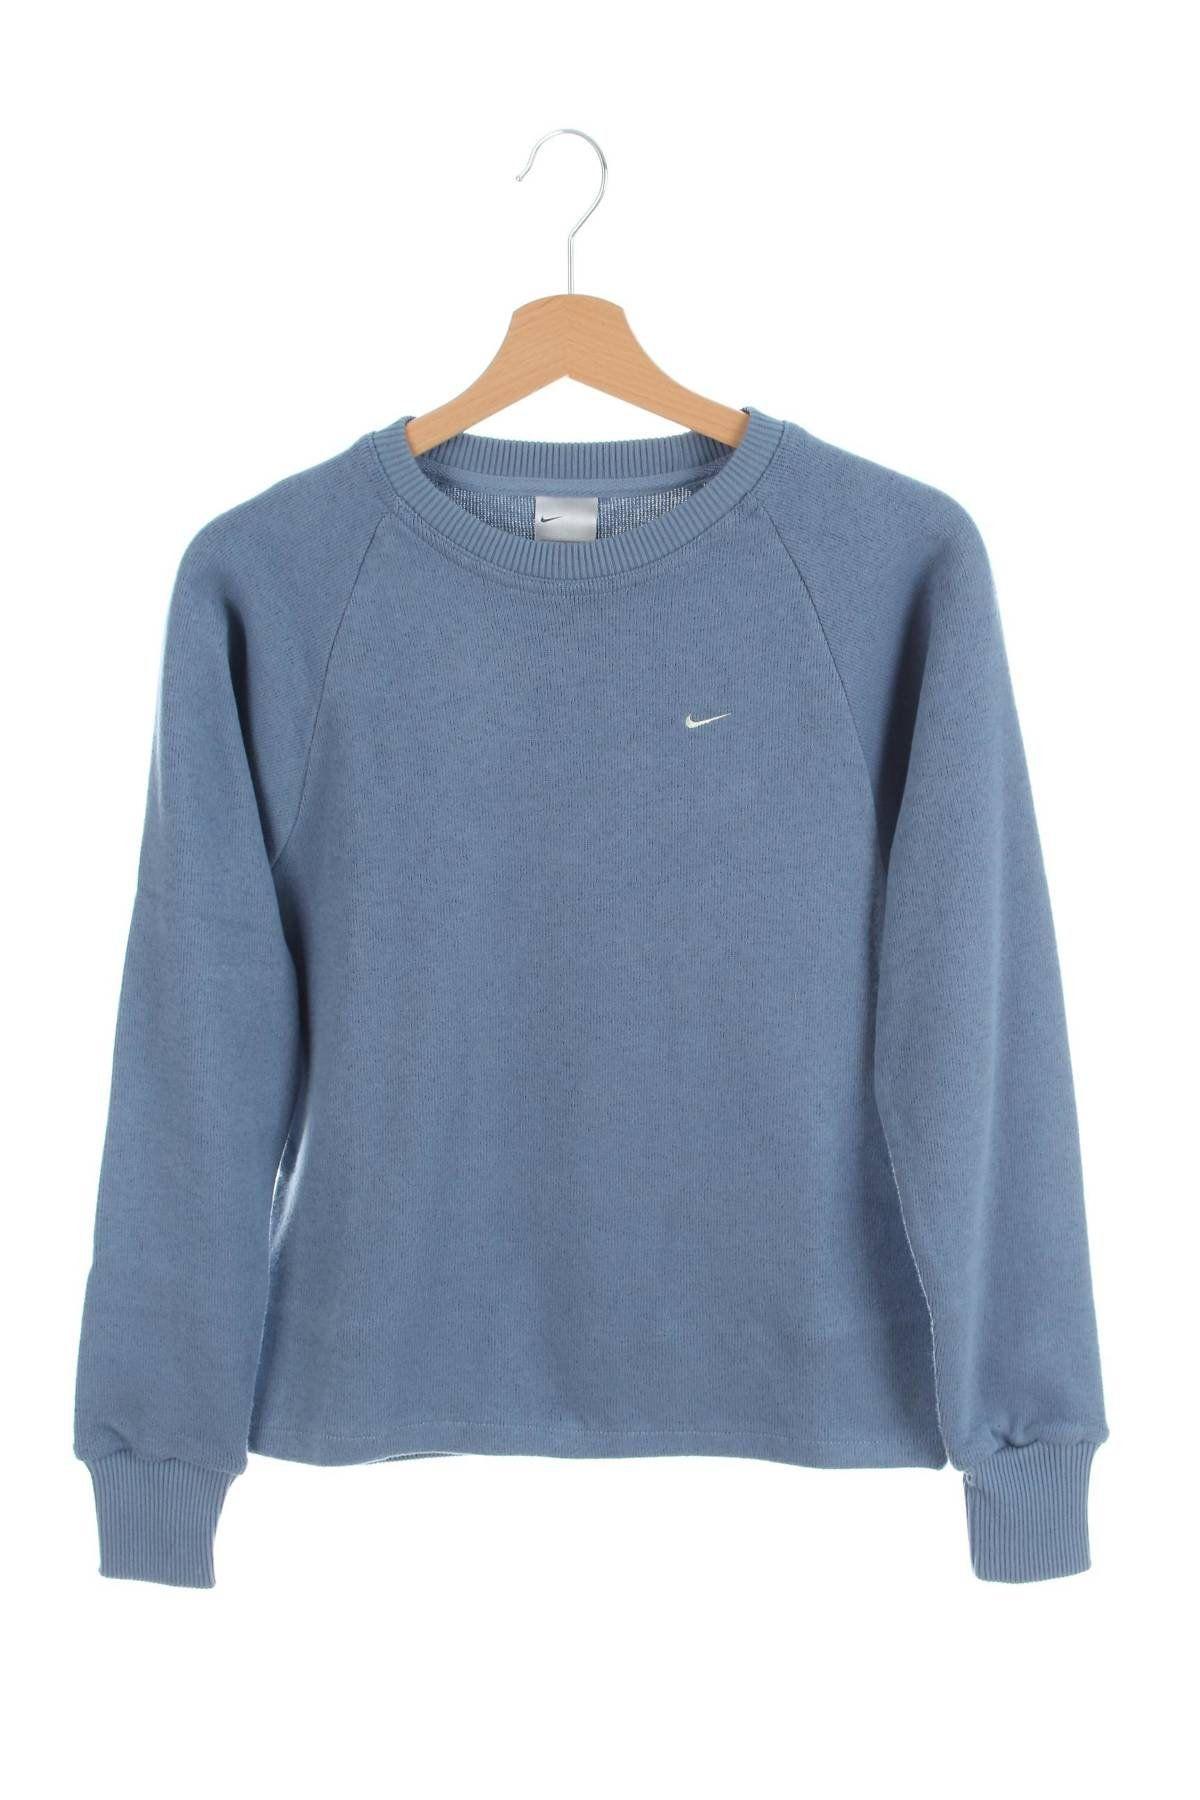 Vintage 90s Nike Small Swoosh Sweatshirt Blue Size S New With Tags Sweatshirts Retro Sweatshirts Vintage Sweatshirt [ 1800 x 1200 Pixel ]